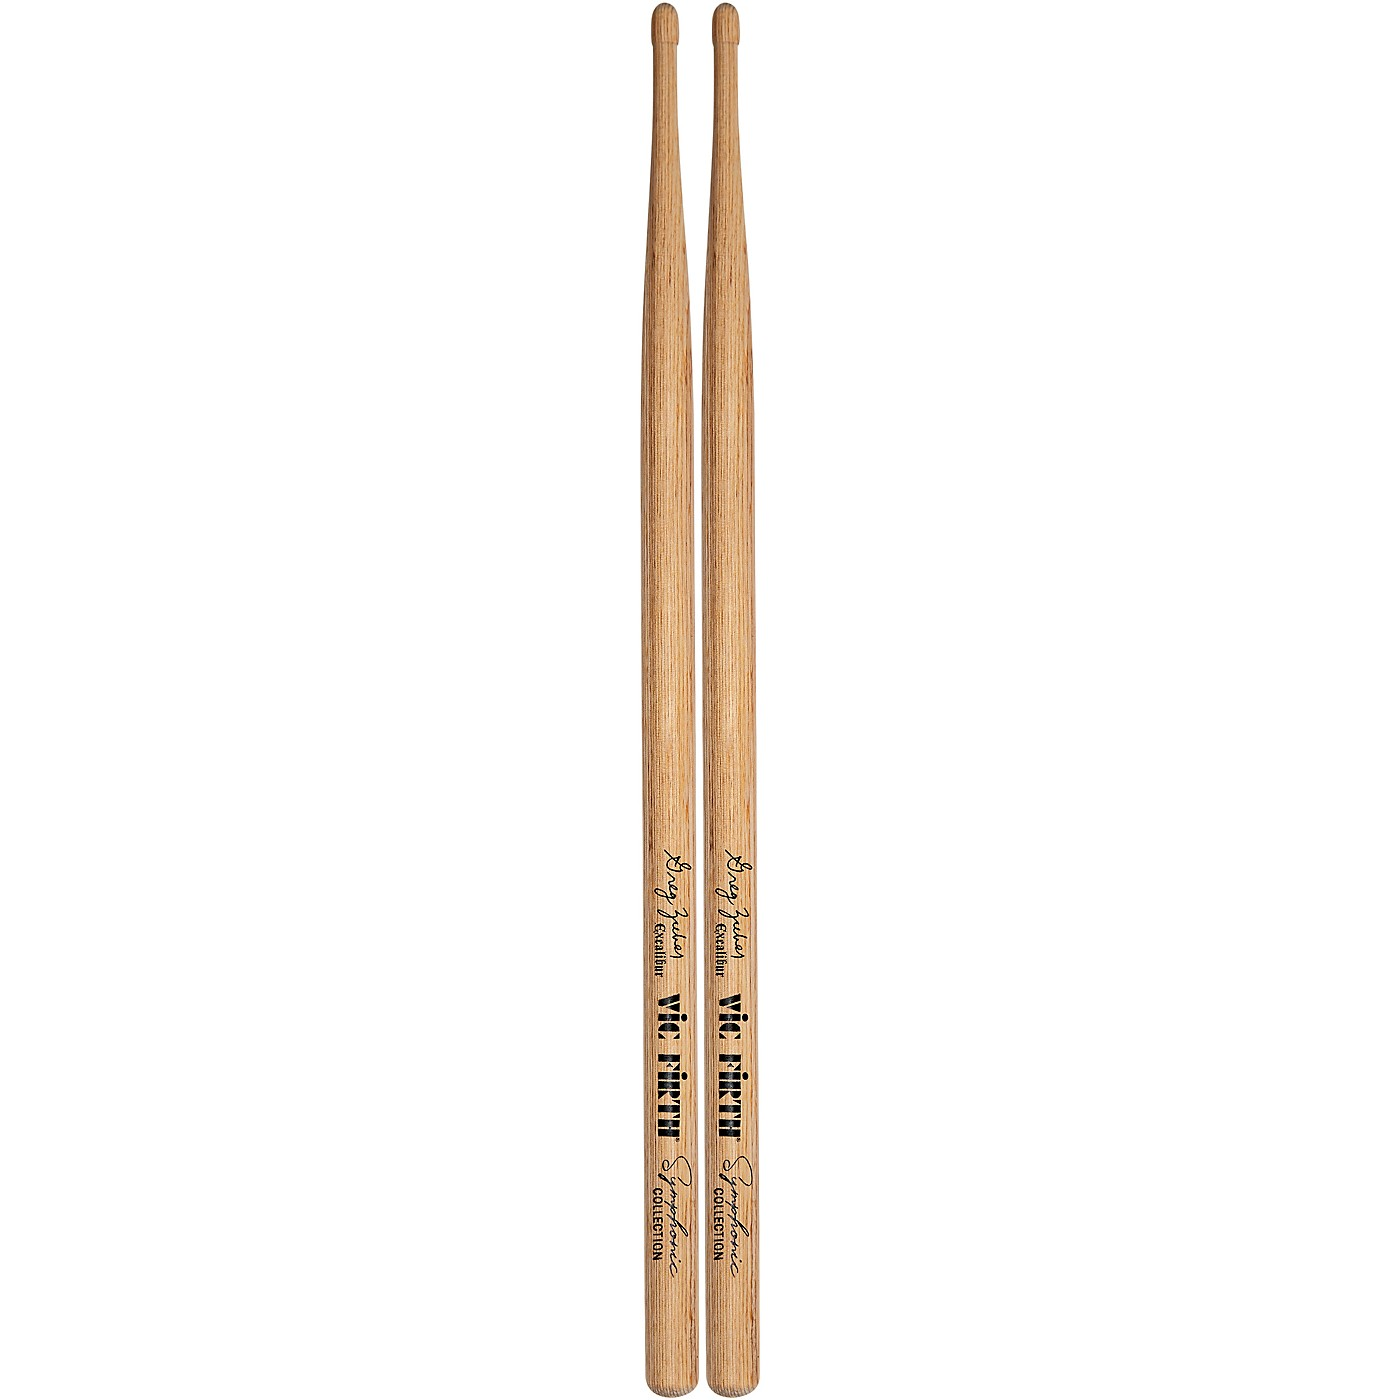 Vic Firth Symphonic Collection Greg Zuber Signature Excalibur Laminated Birch Drum Sticks thumbnail